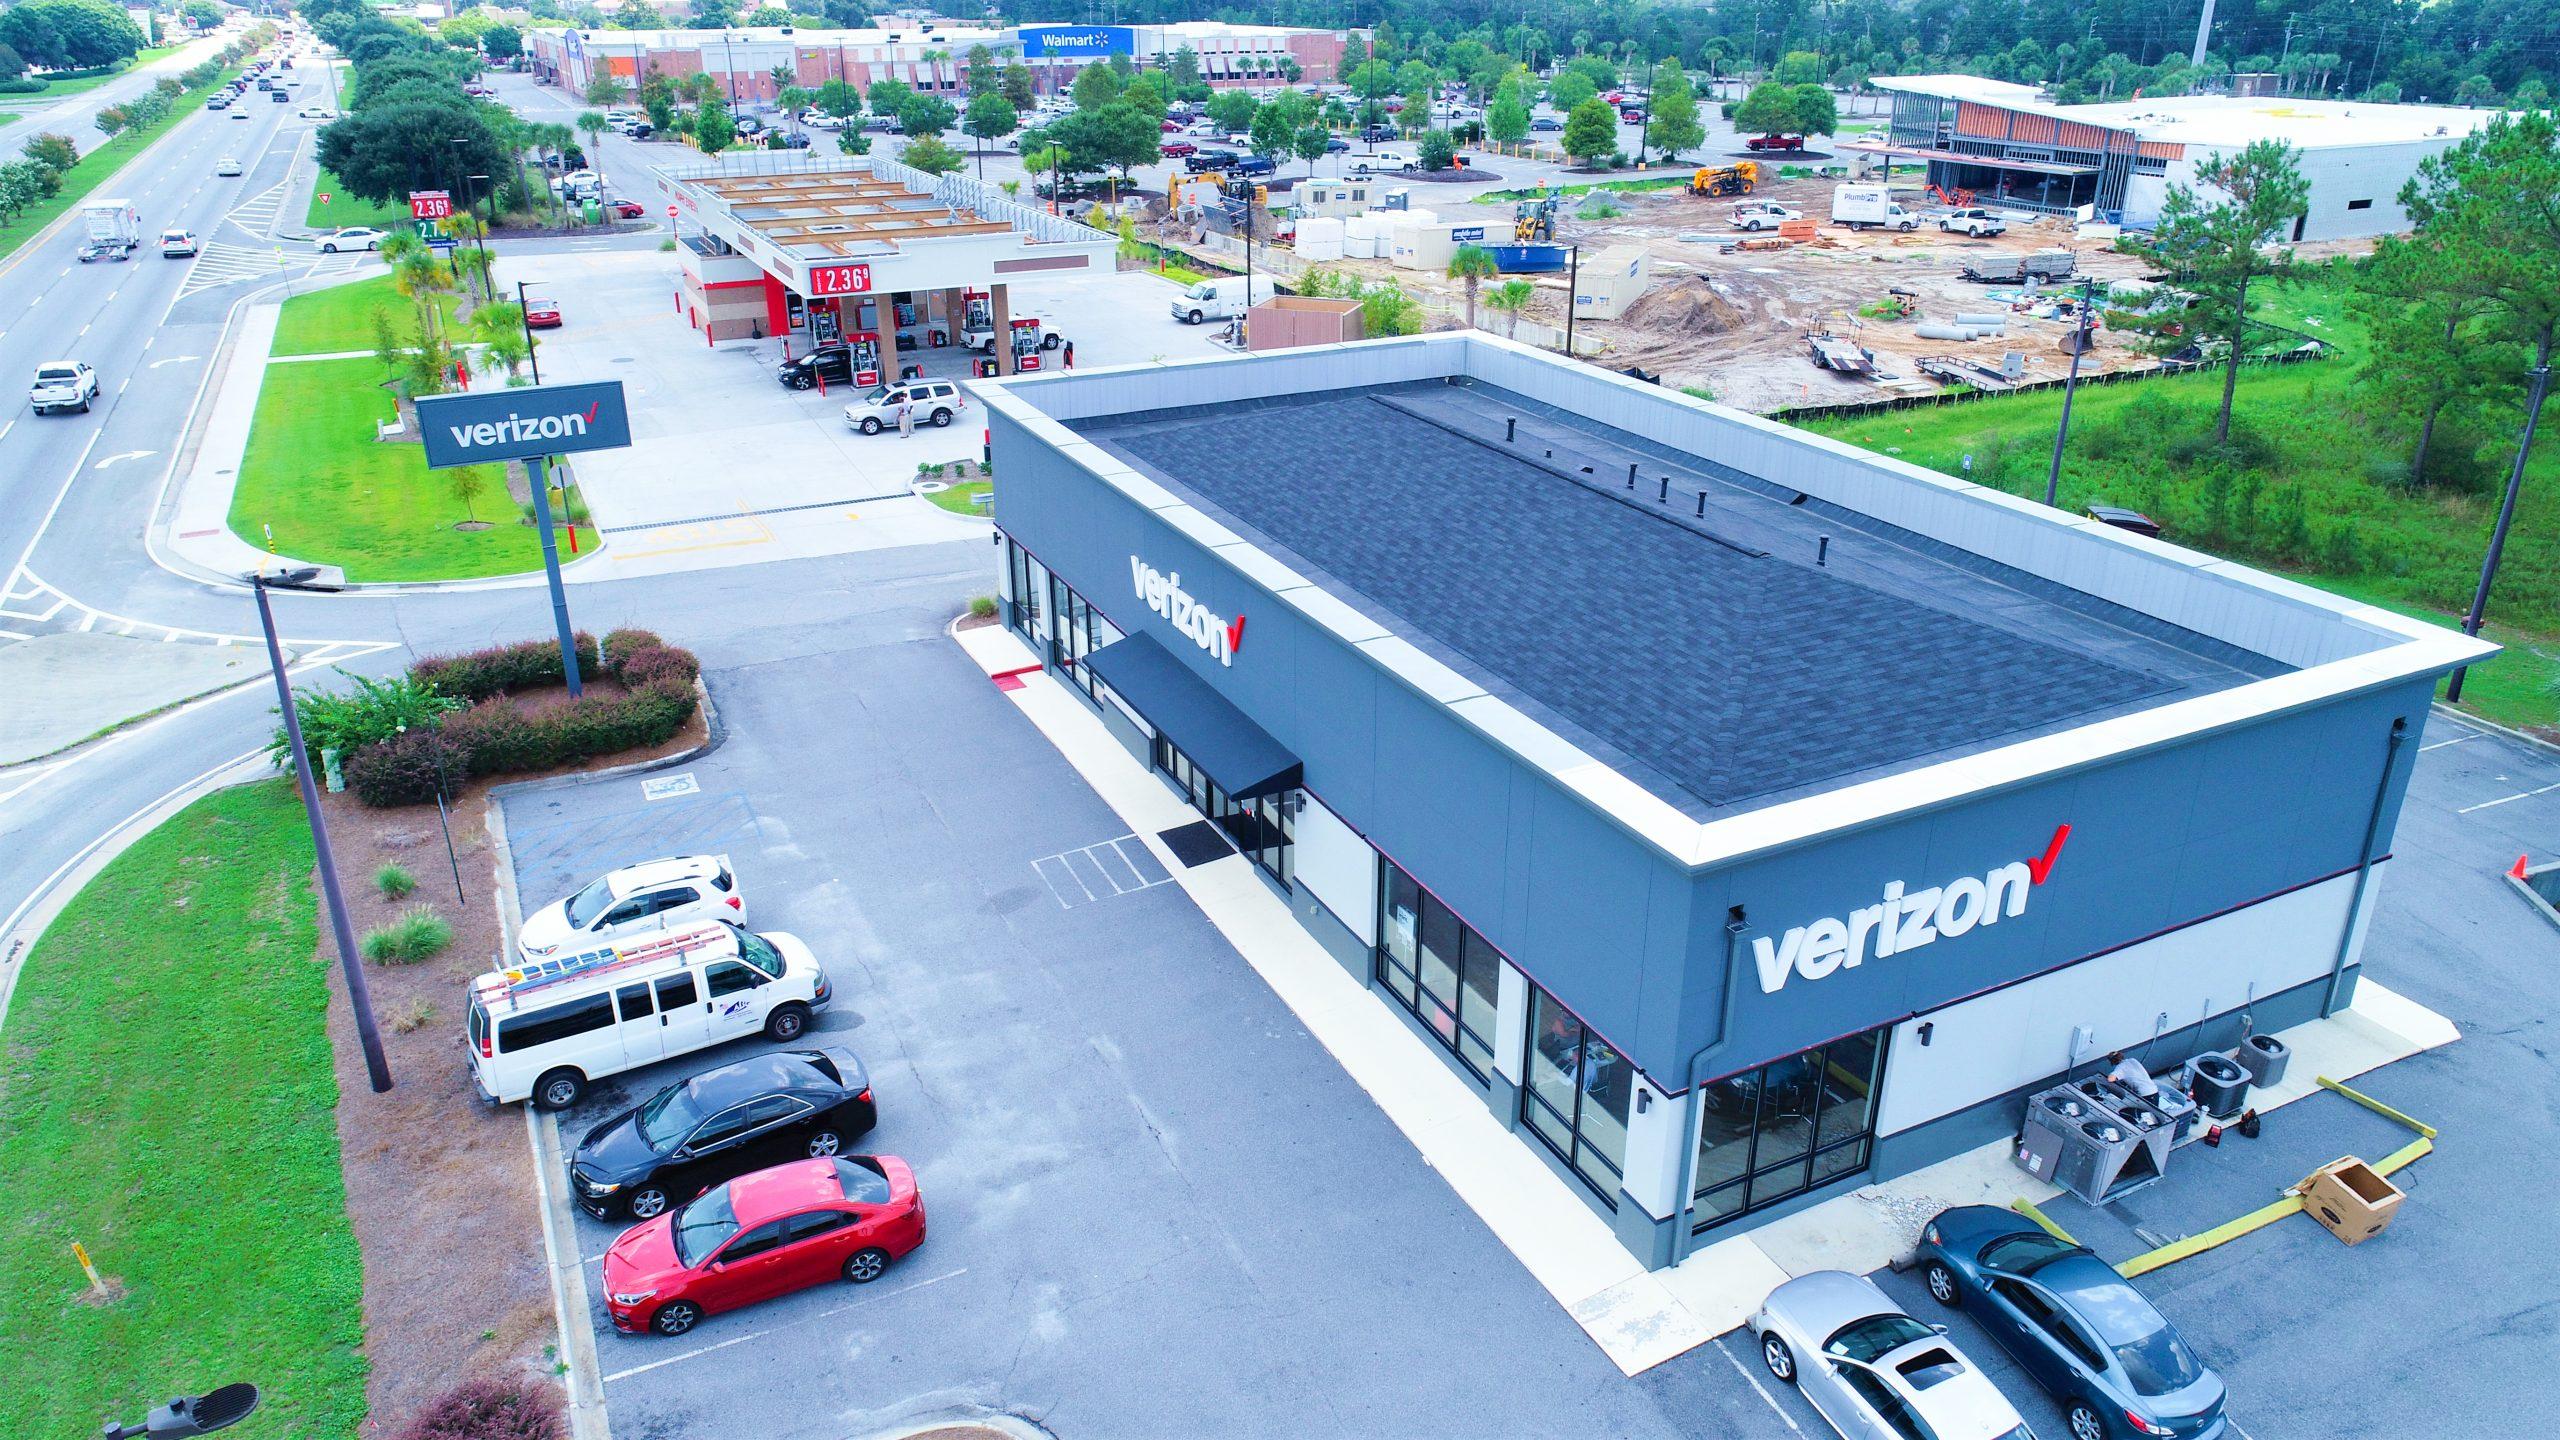 Verizon (Cellular Sales)